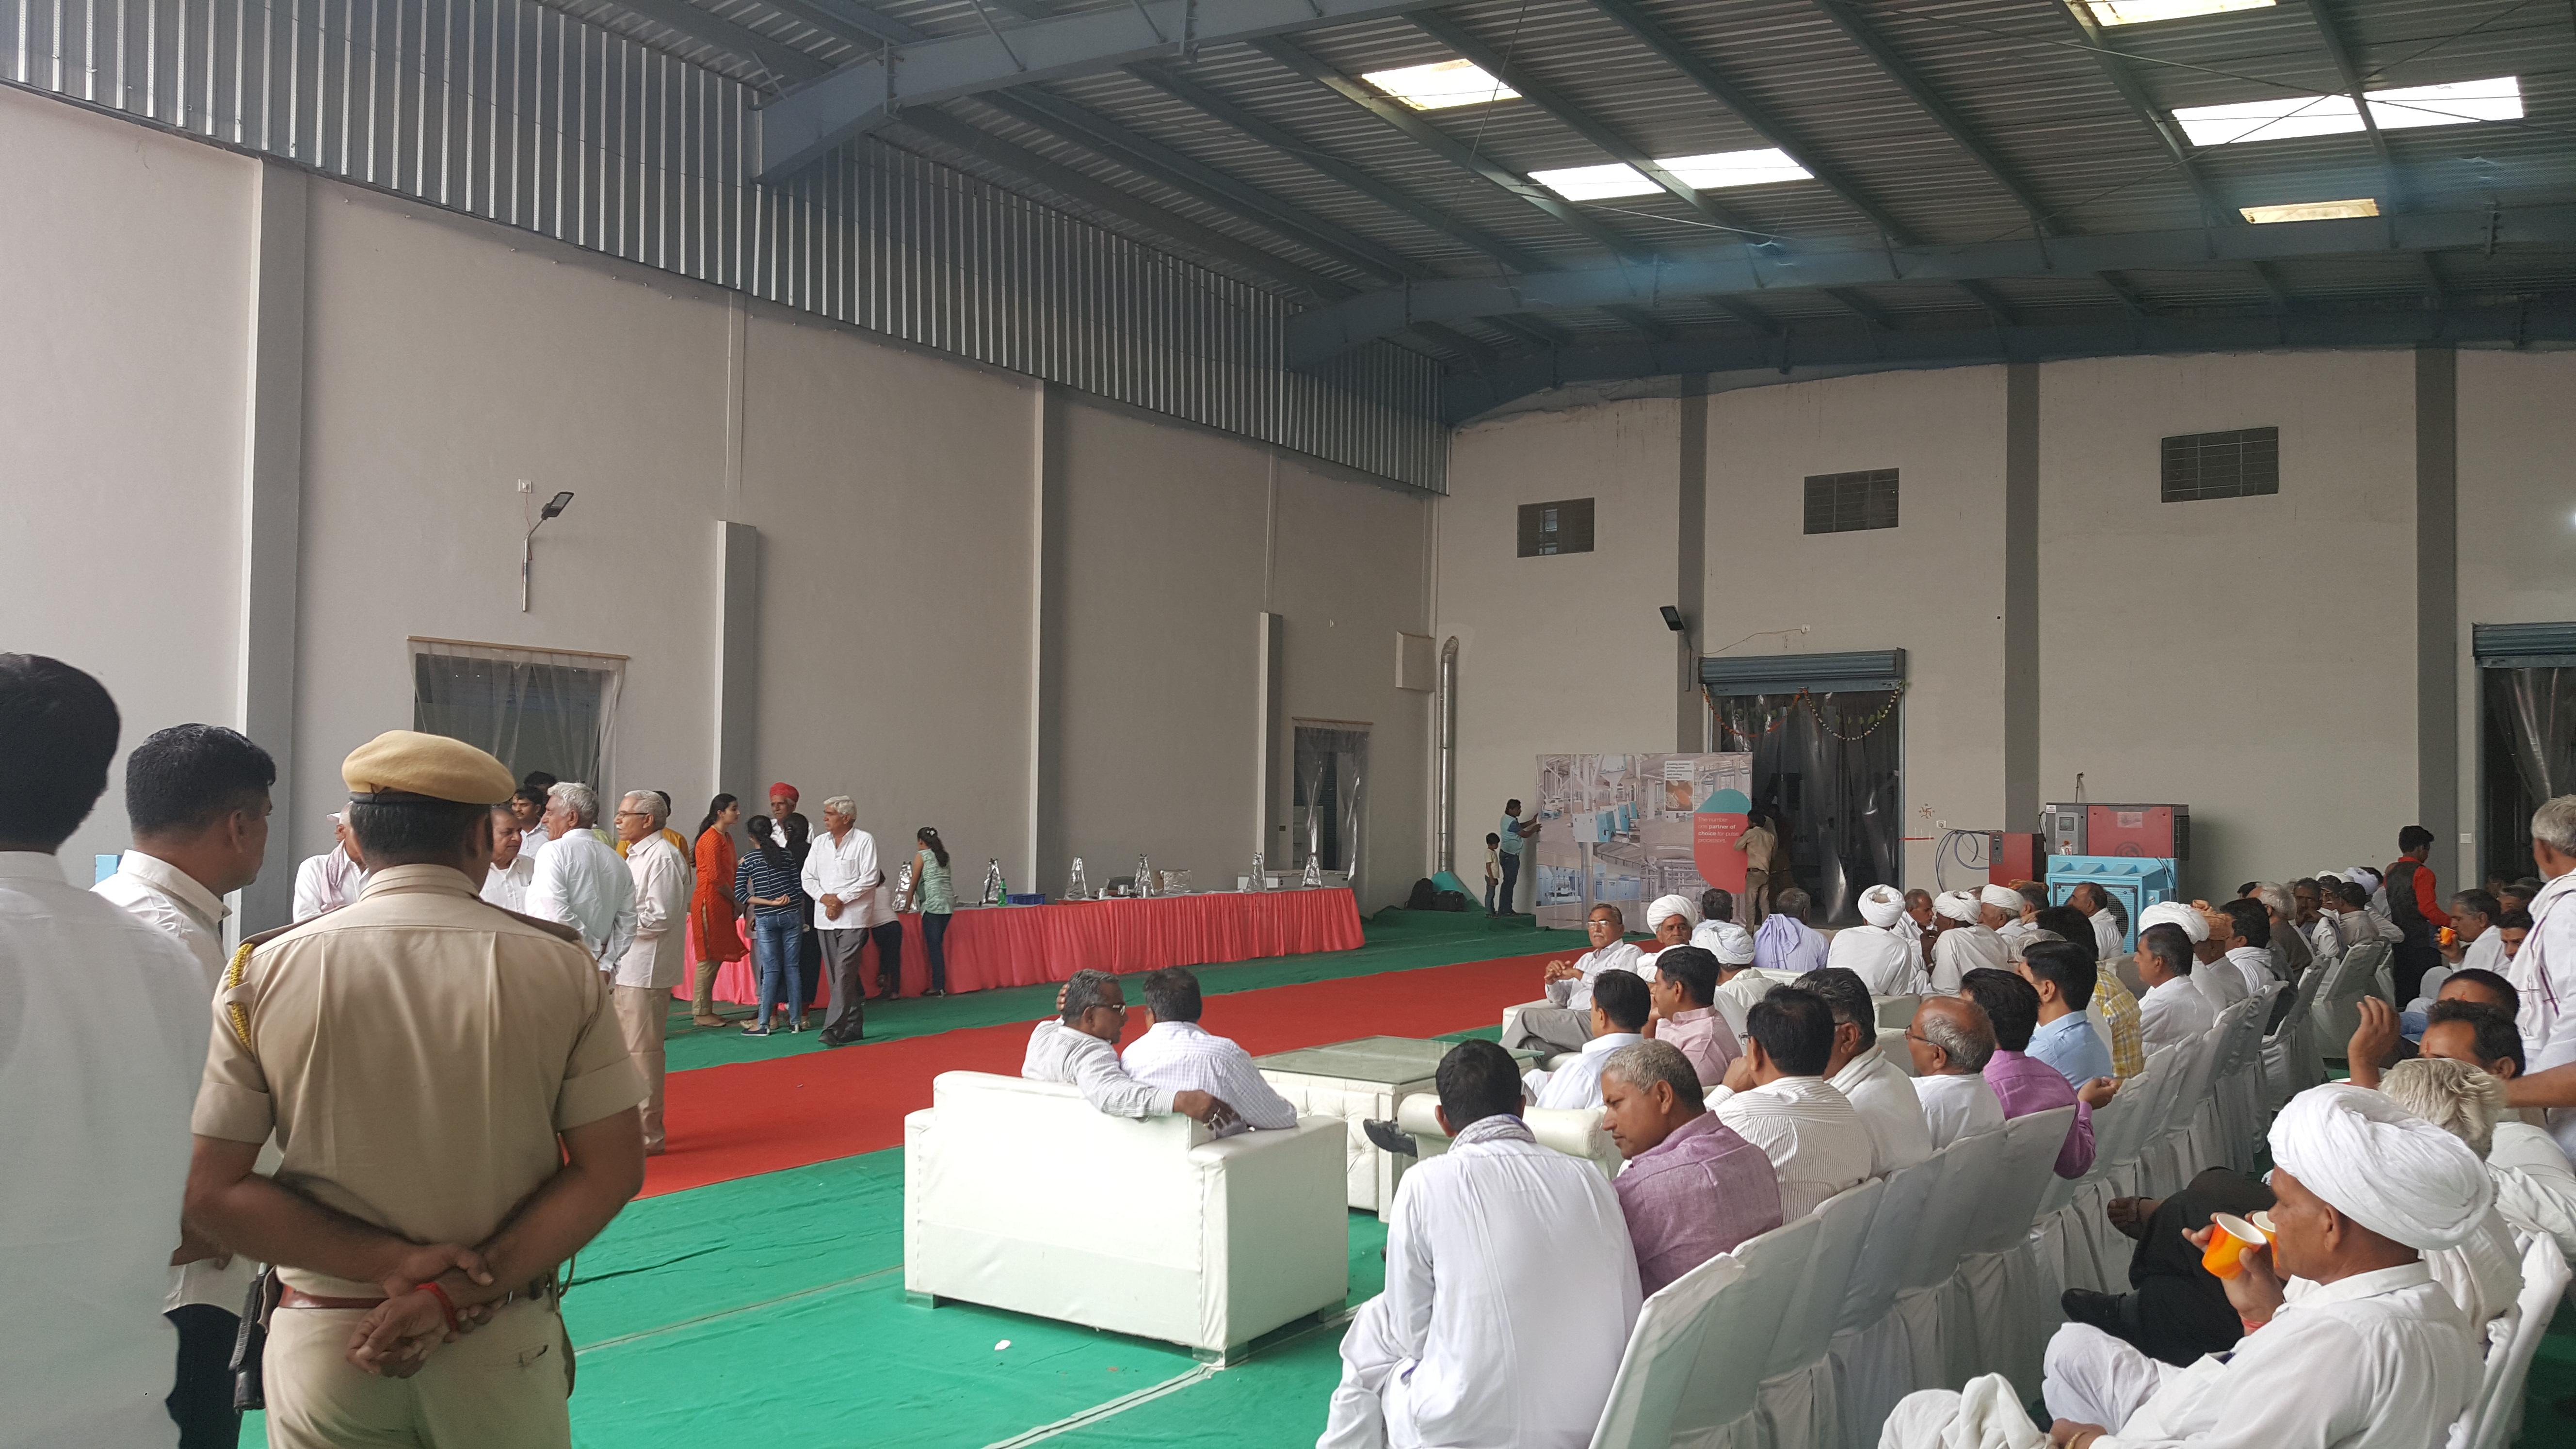 Inauguration Ceremony Of Moong Dal Plant at Bikaner.